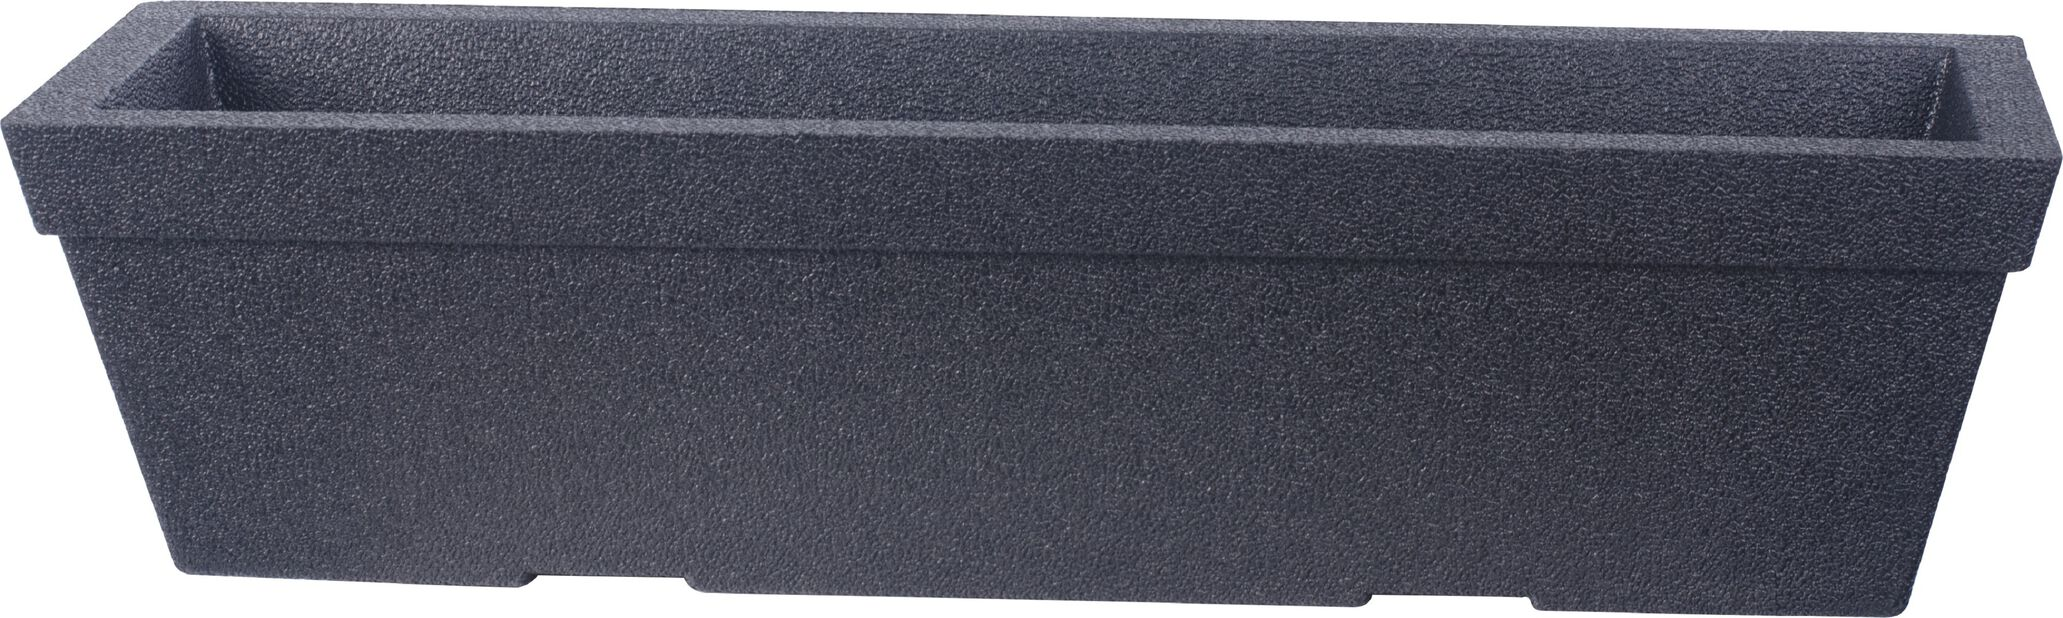 Balkongkasse Milla, Ø76 cm, Svart